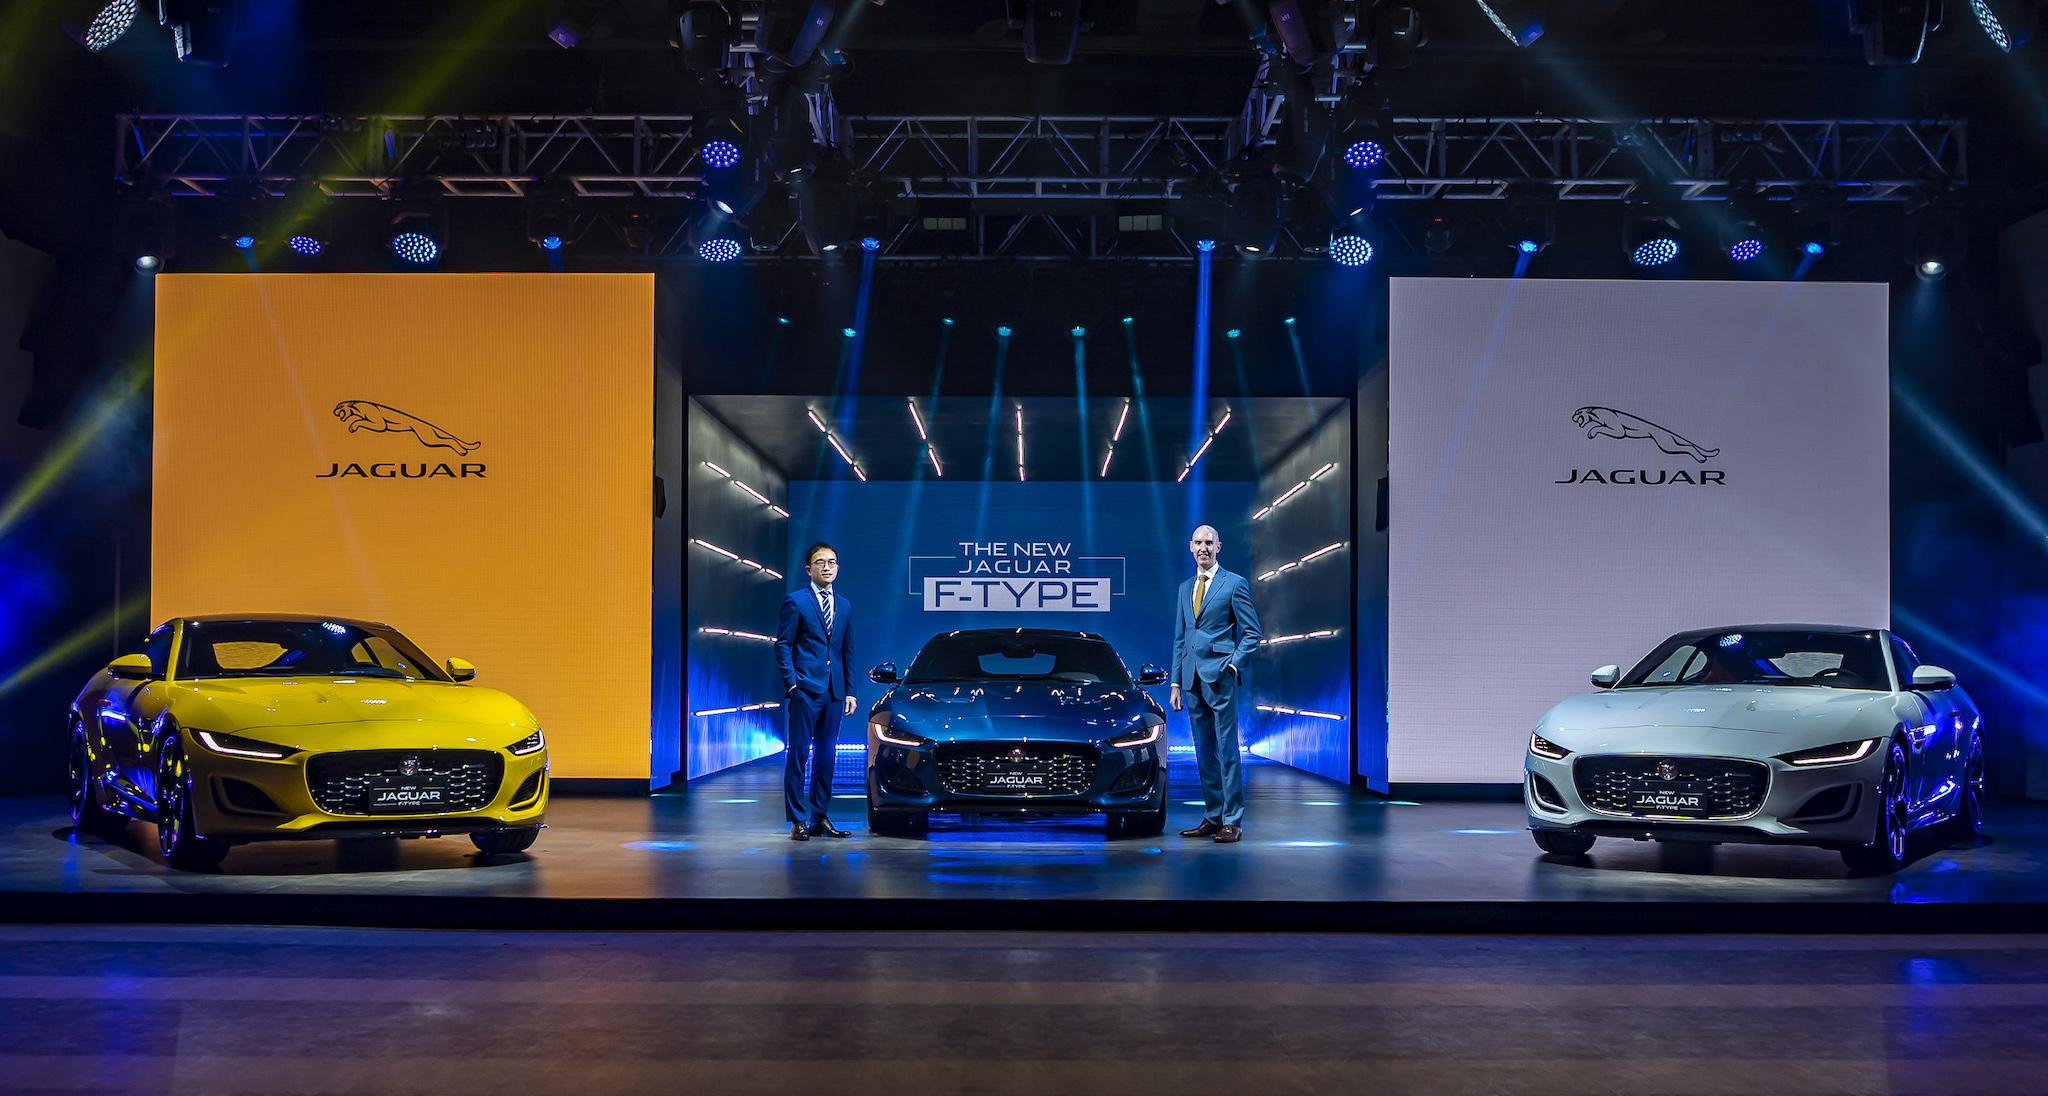 Jaguar Land Rover Taiwan 台灣捷豹路虎總經理 Garth Turnbull (右)與品牌總監張君維(左)一同發表 Jaguar F-Type P300 R-Dynamic 與 P450 R-Dynamic 雙車型。